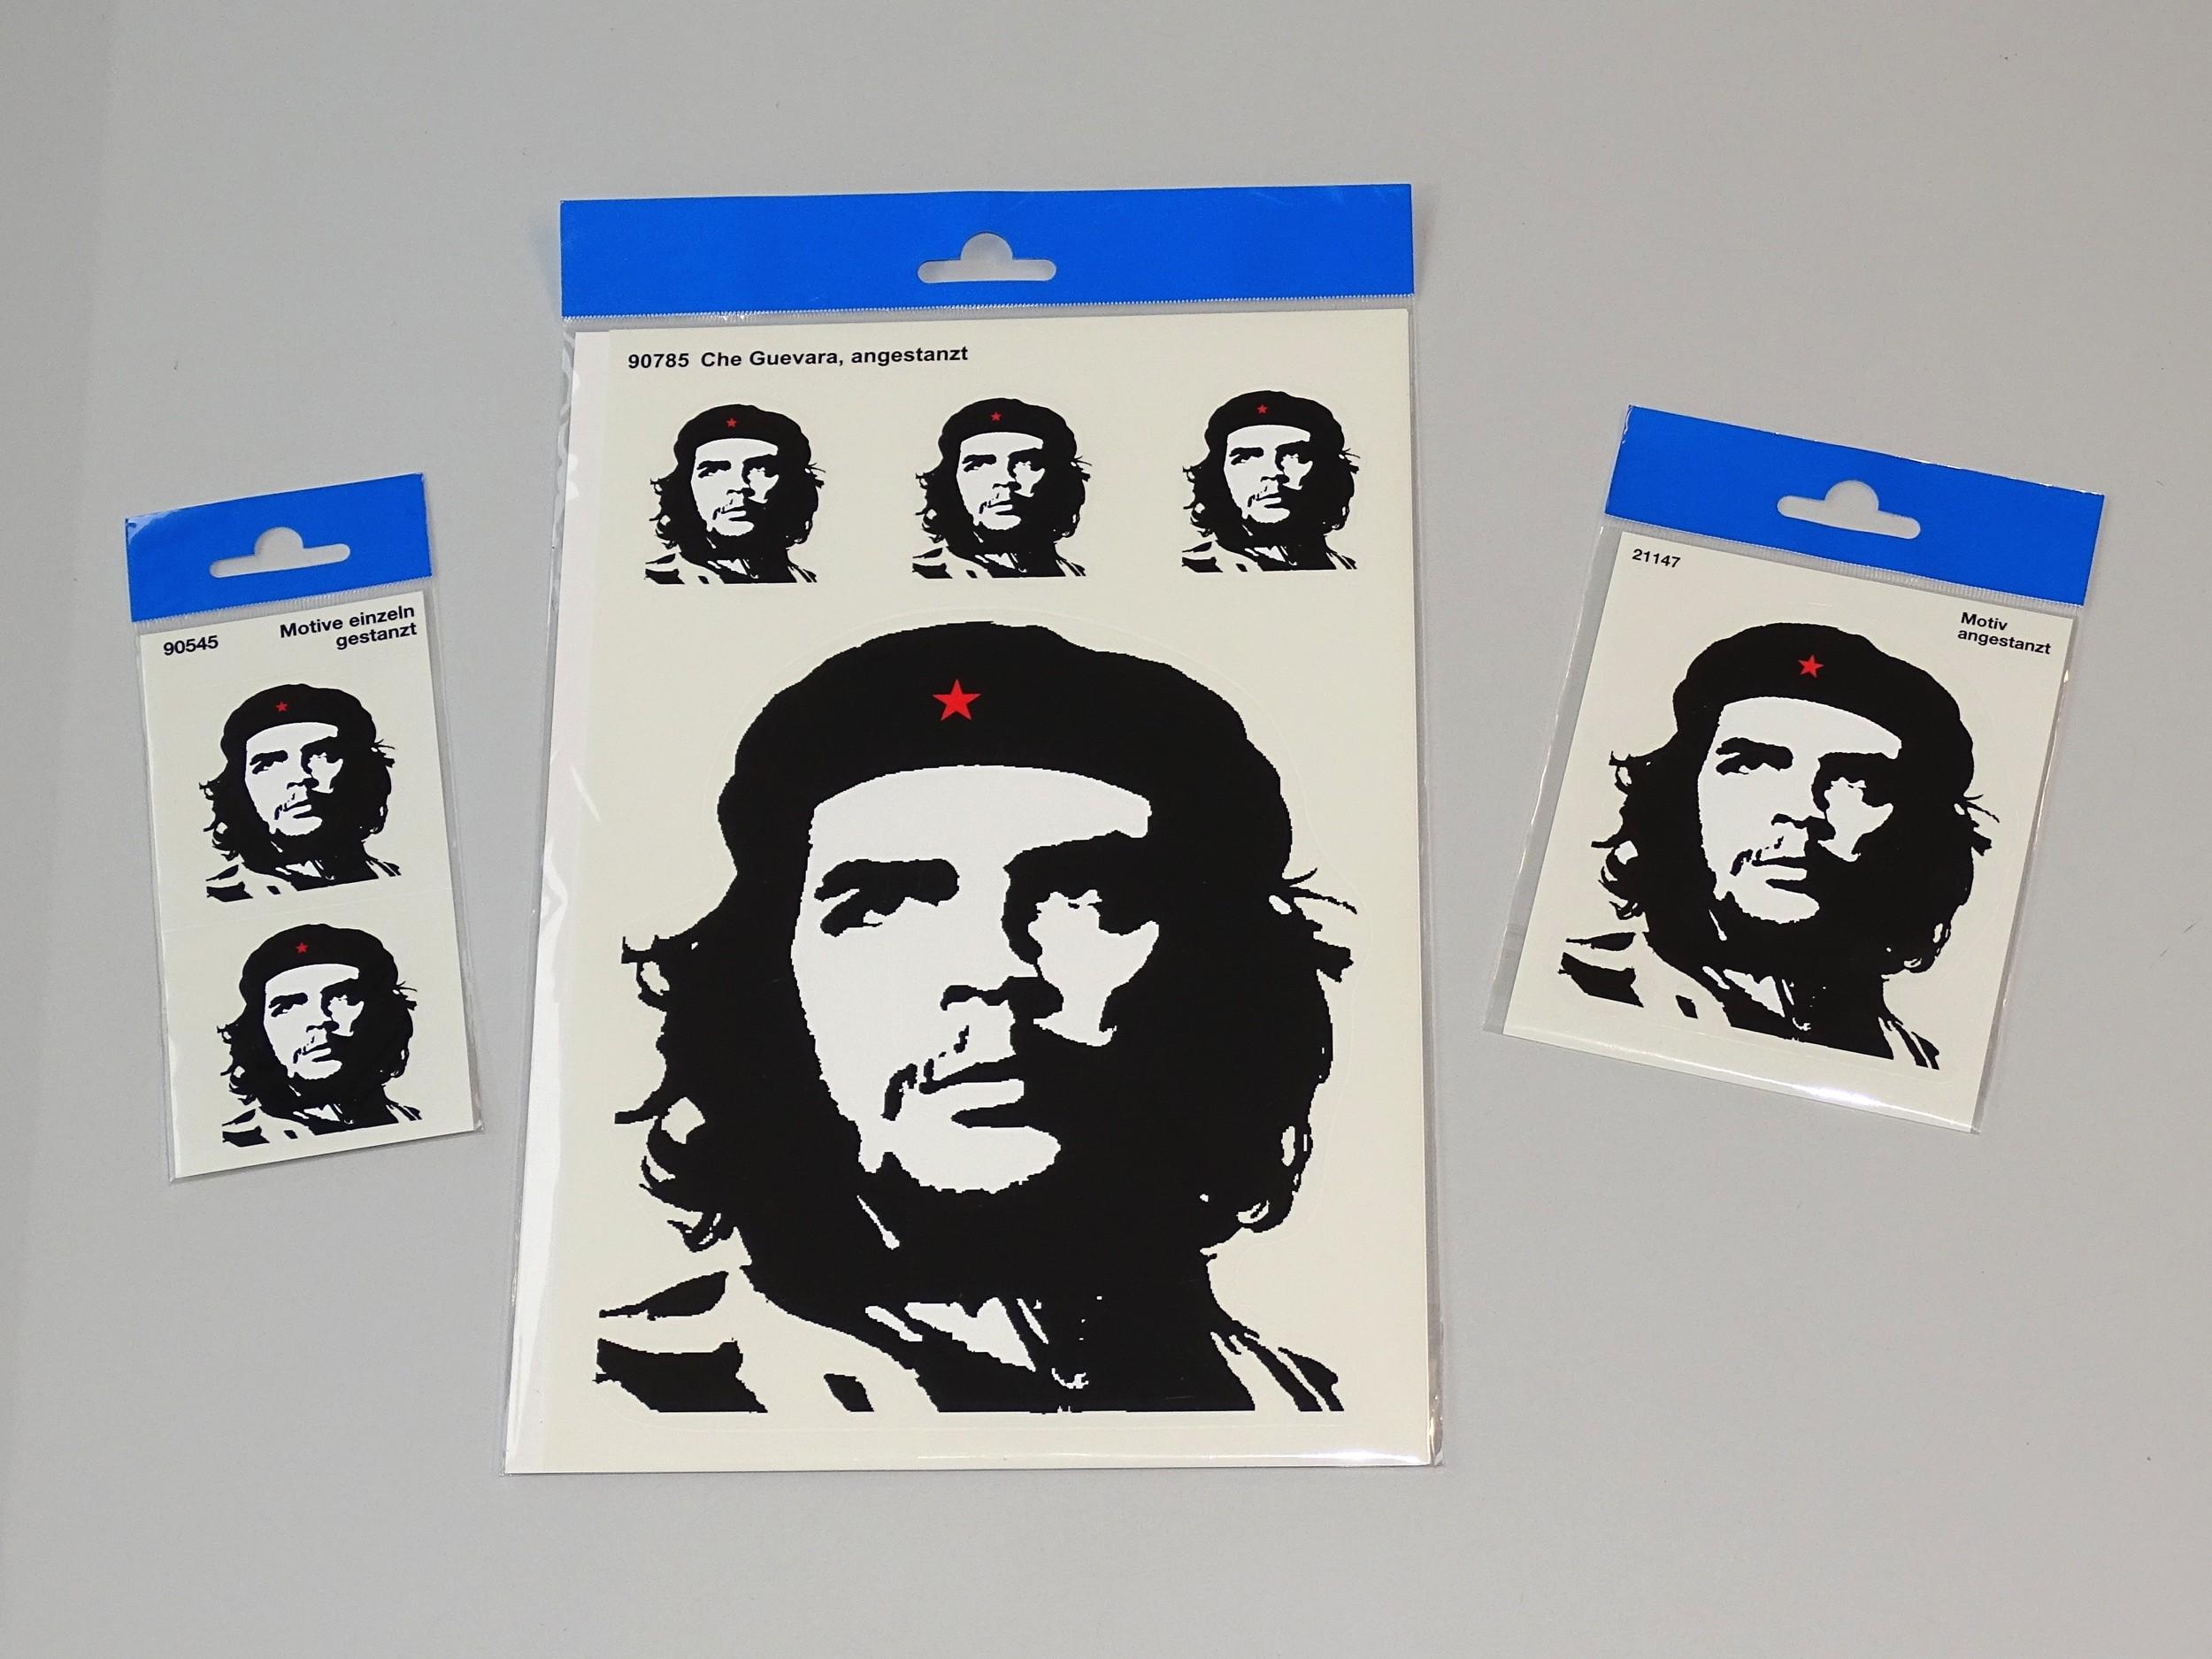 Aufkleber Che Guevara Kontur 135 x 110 mm – Bild 2